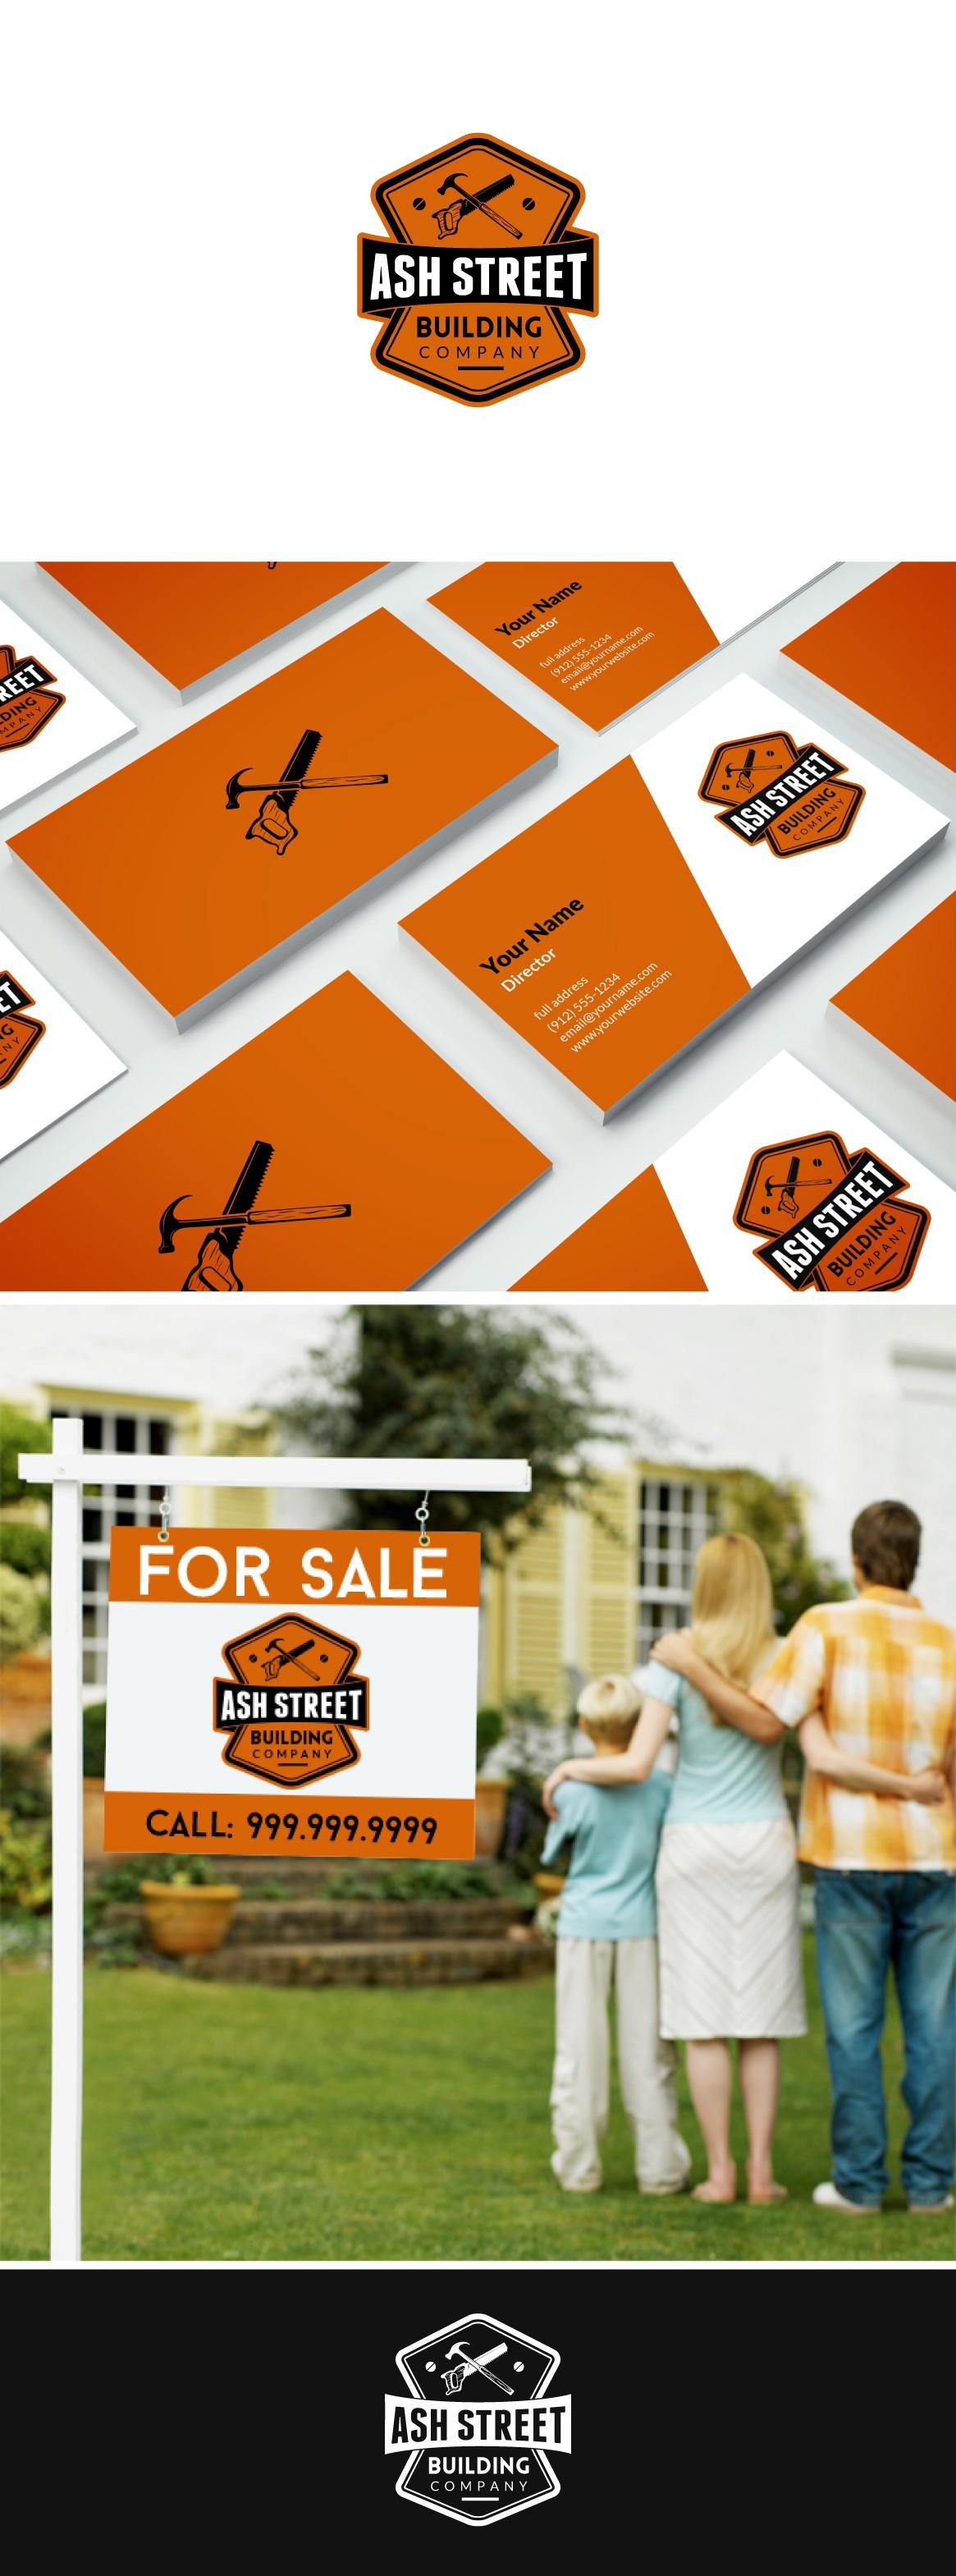 Help a new home building company create a vintage logo